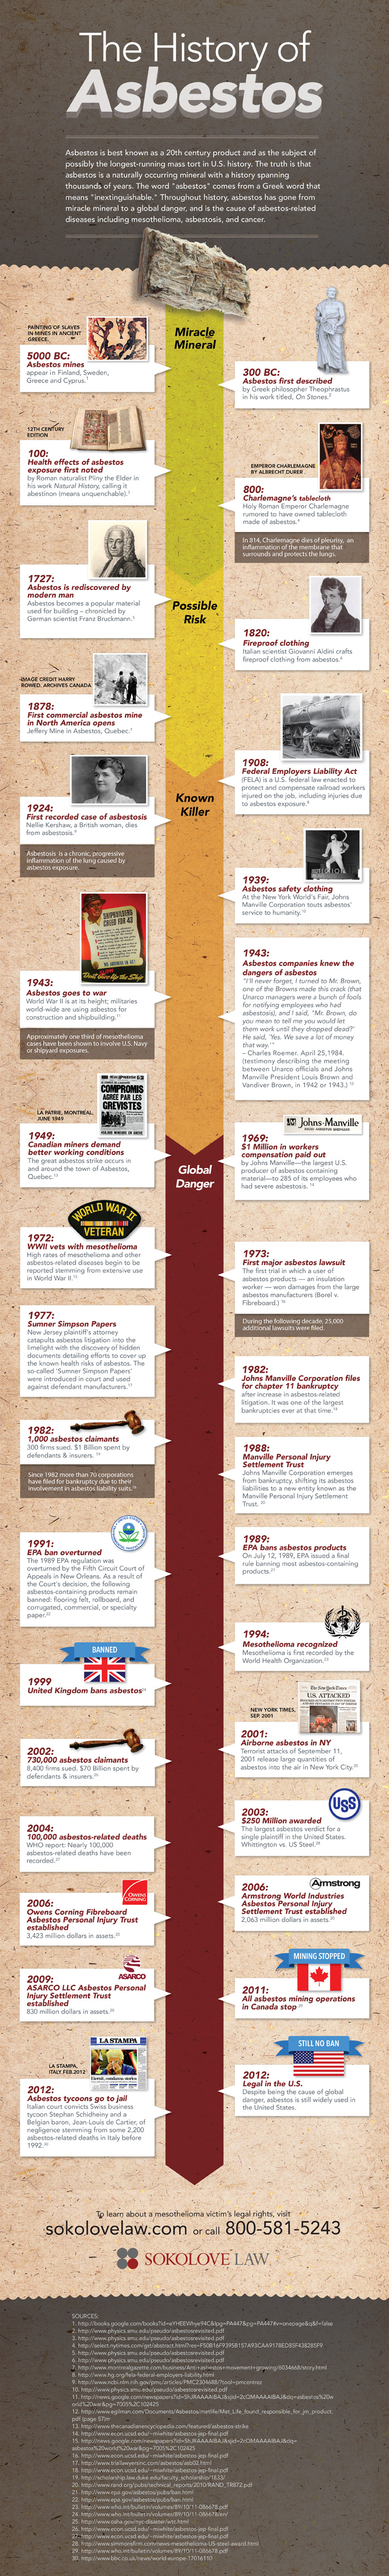 25++ Asbestos years of use